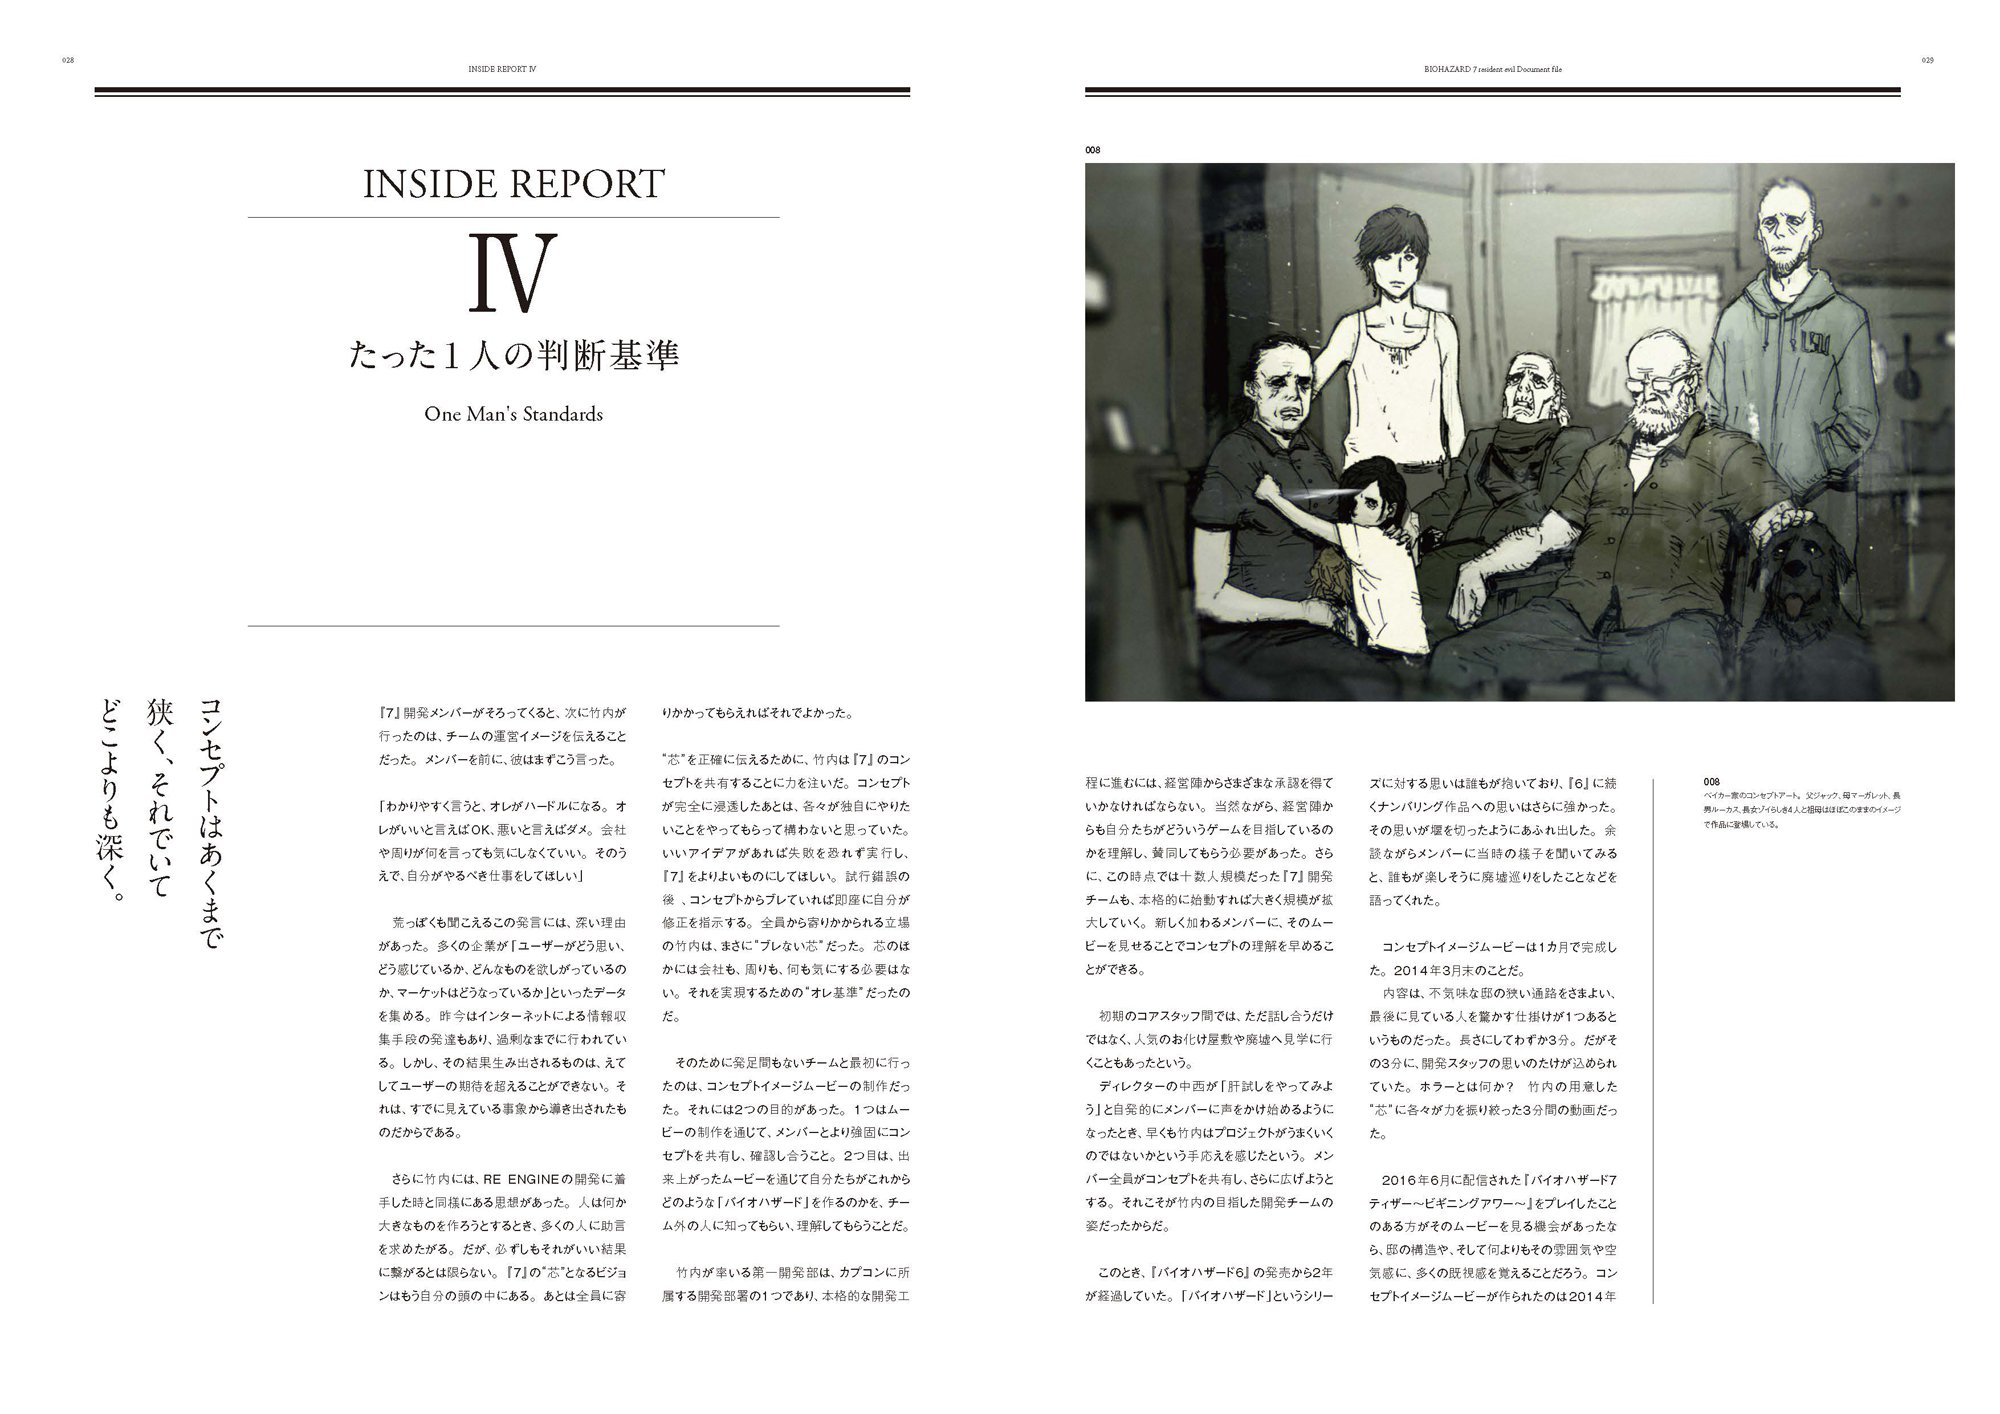 Biohazard 7 Resident Evil Document File (Printed in Japanese